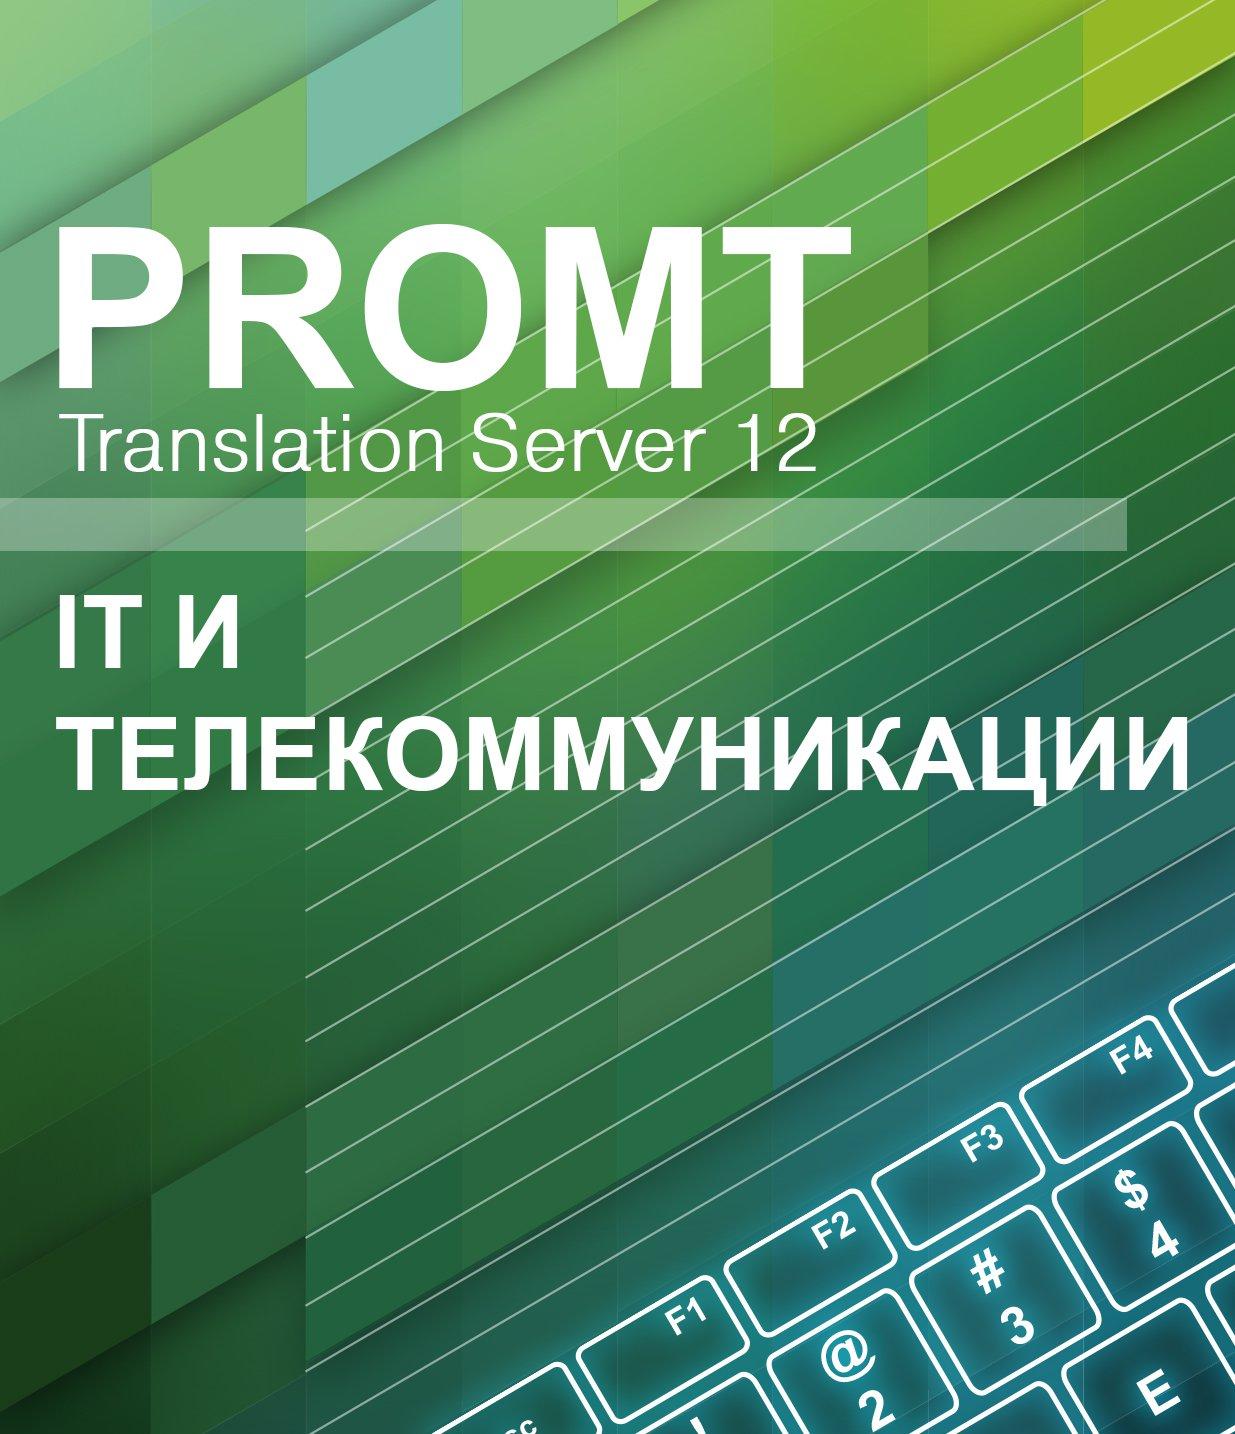 promt_start_W+.png